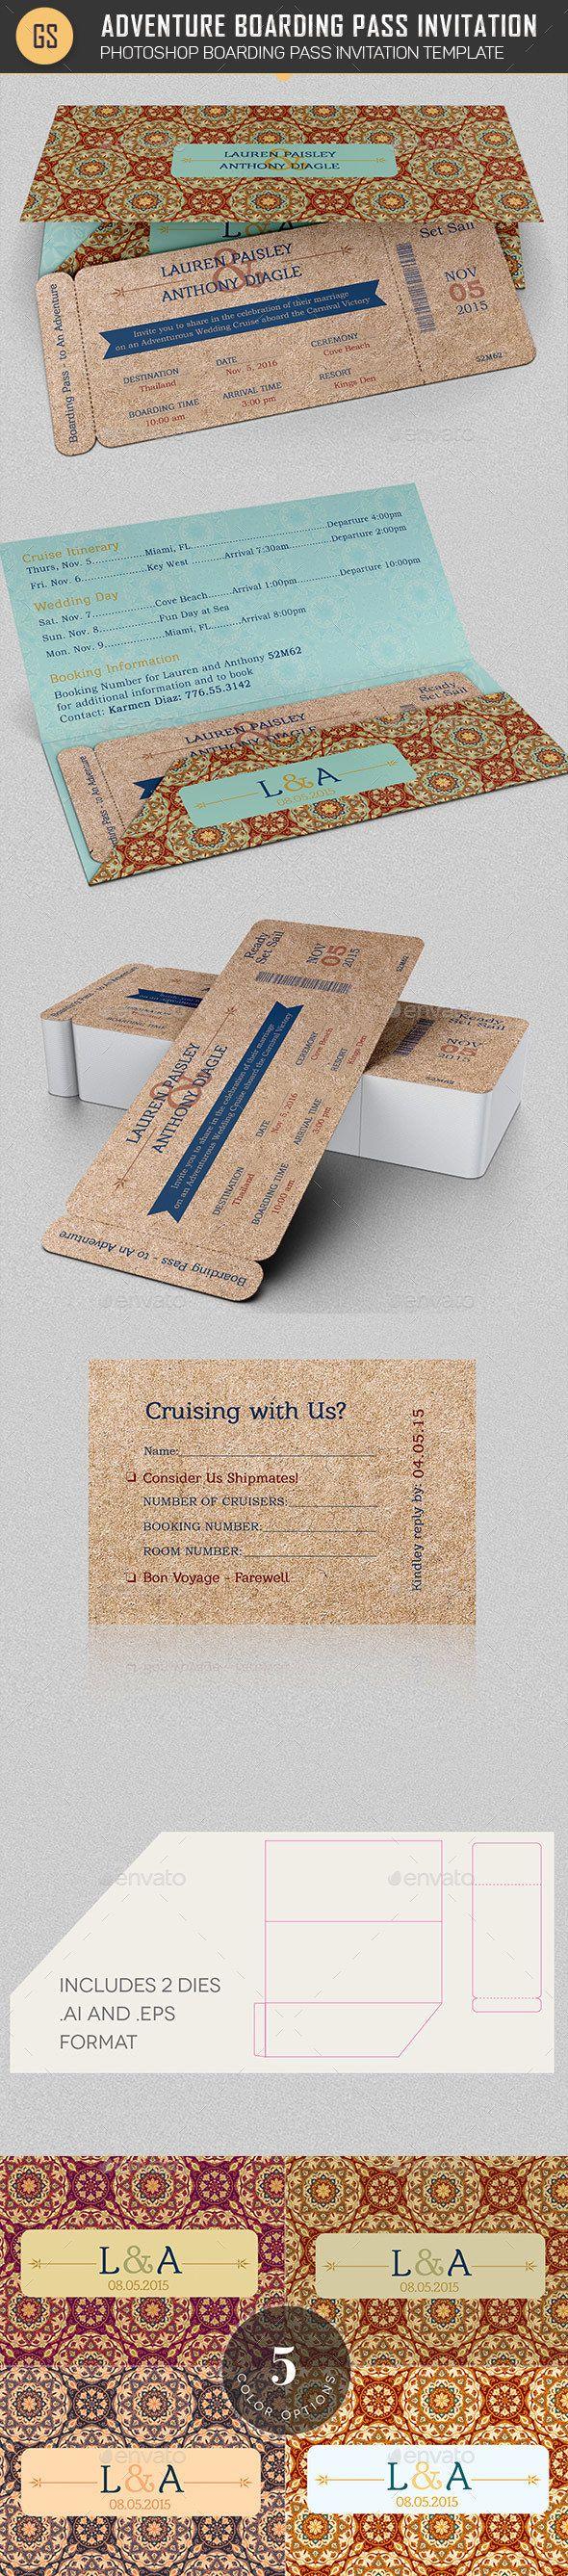 Wedding Adventure Boarding Pass Invitation Template   Empfänge ...